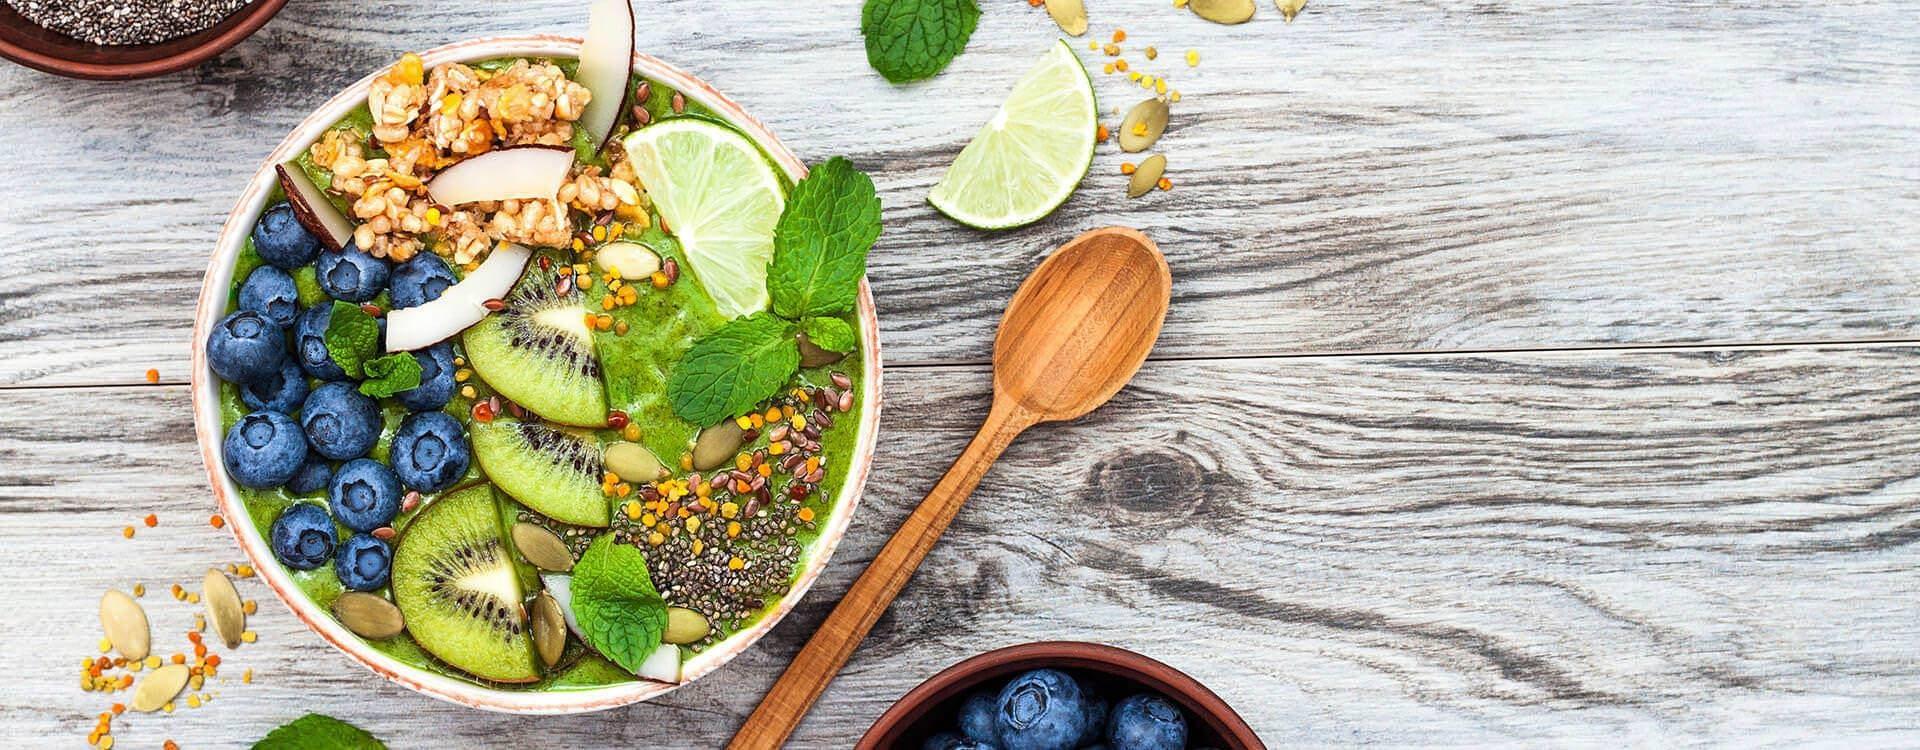 Mana Blend | Super Food Powder for Health & Vitality